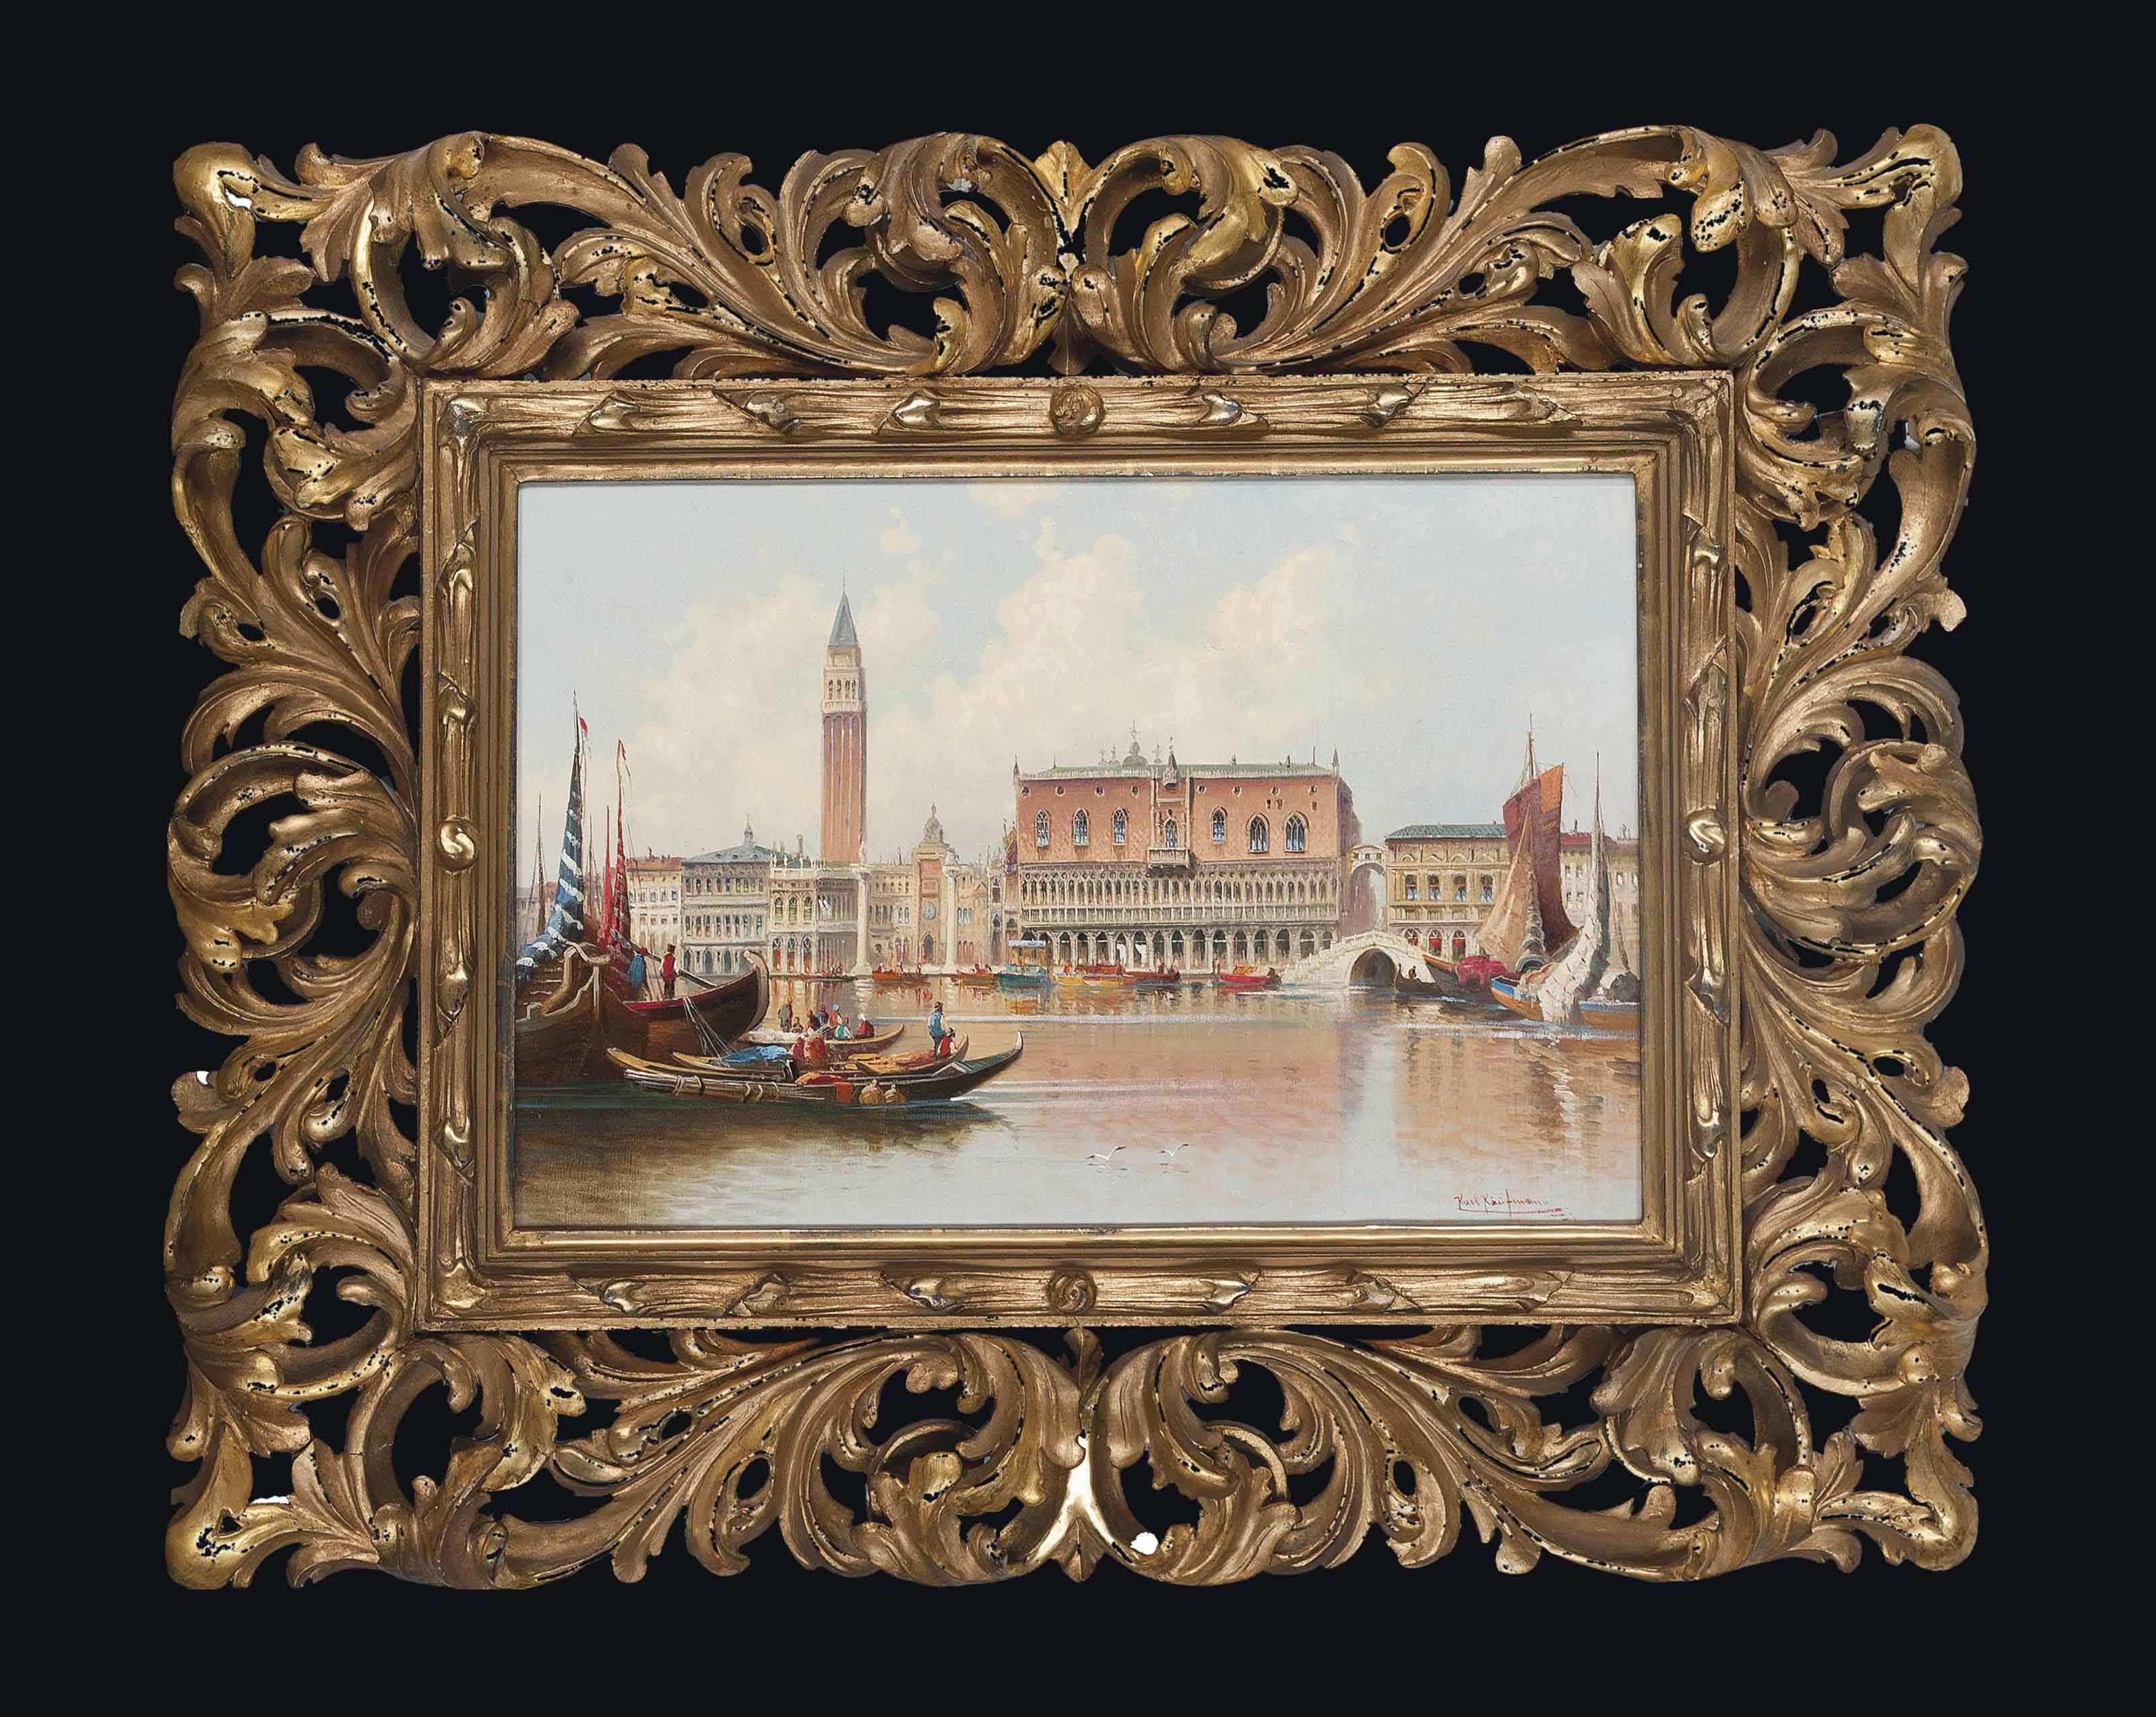 Trading vessels before the Molo, Venice